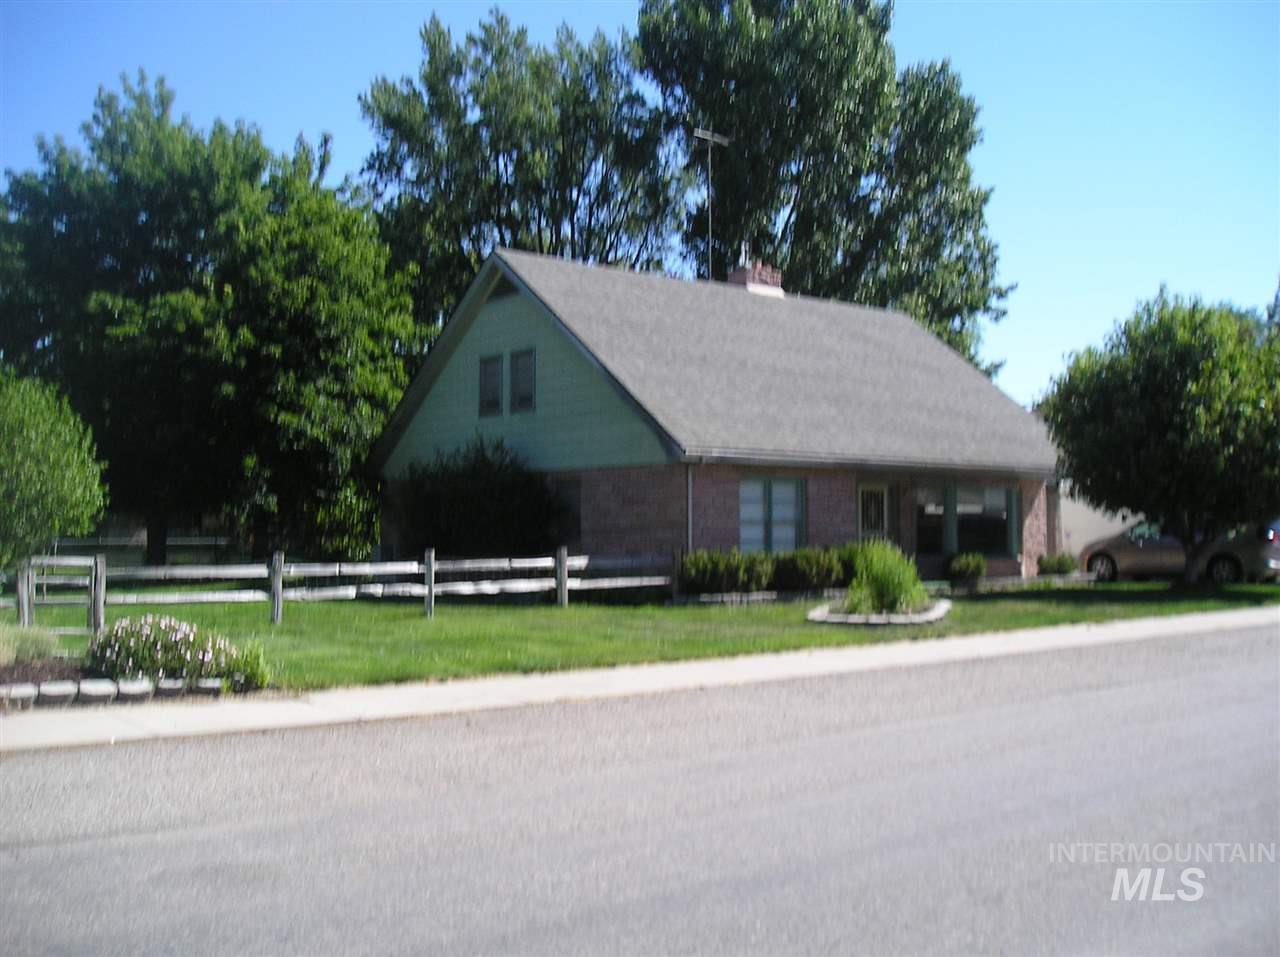 610 E 8th Ave, Gooding, ID 83330